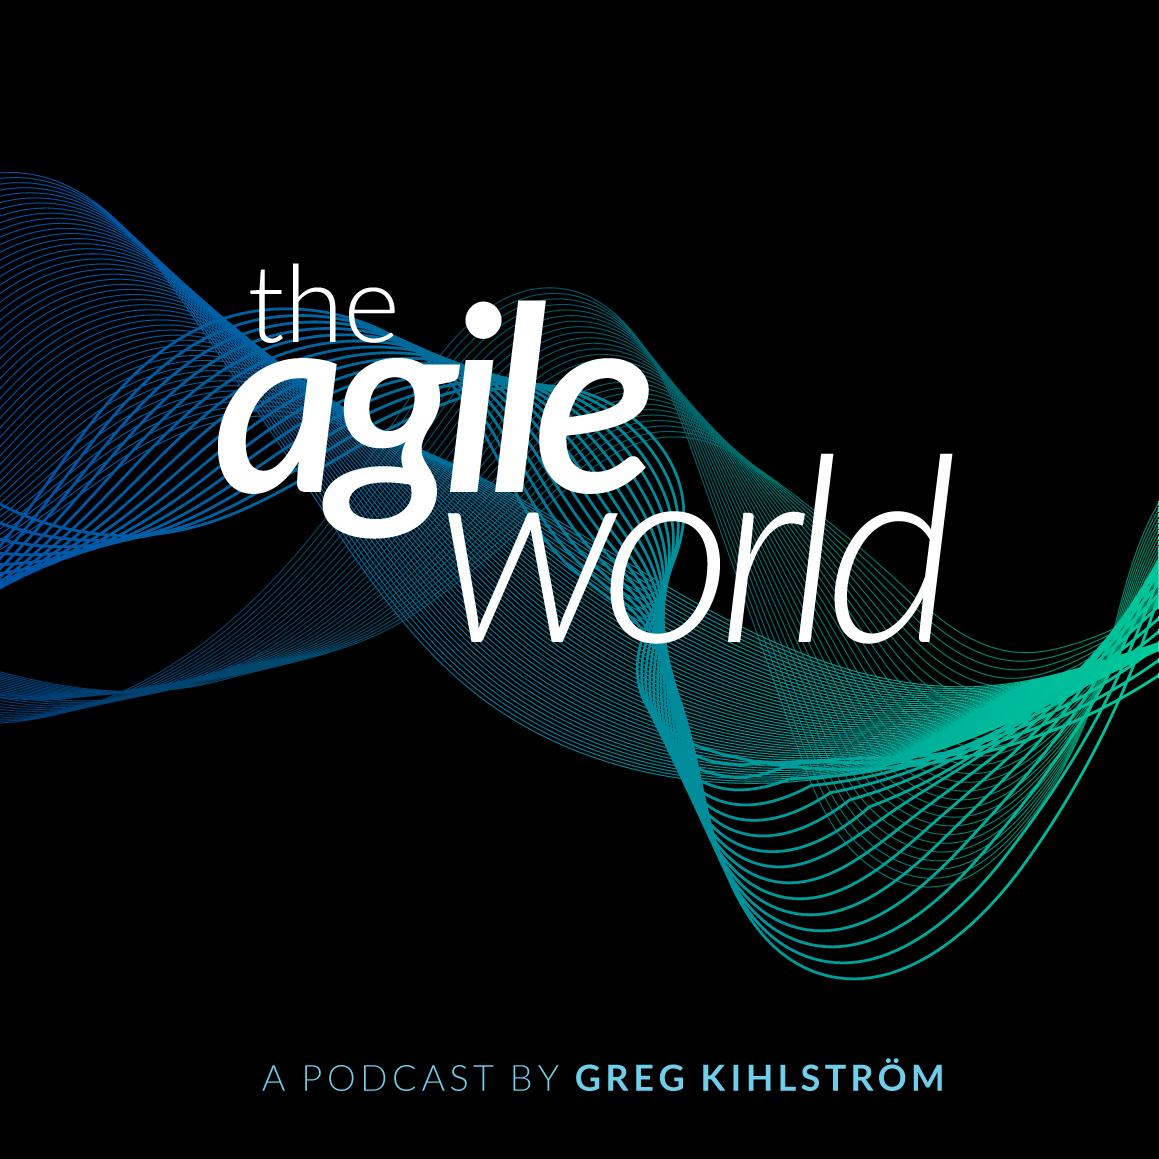 The Agile World podcast by Greg Kihlstrom